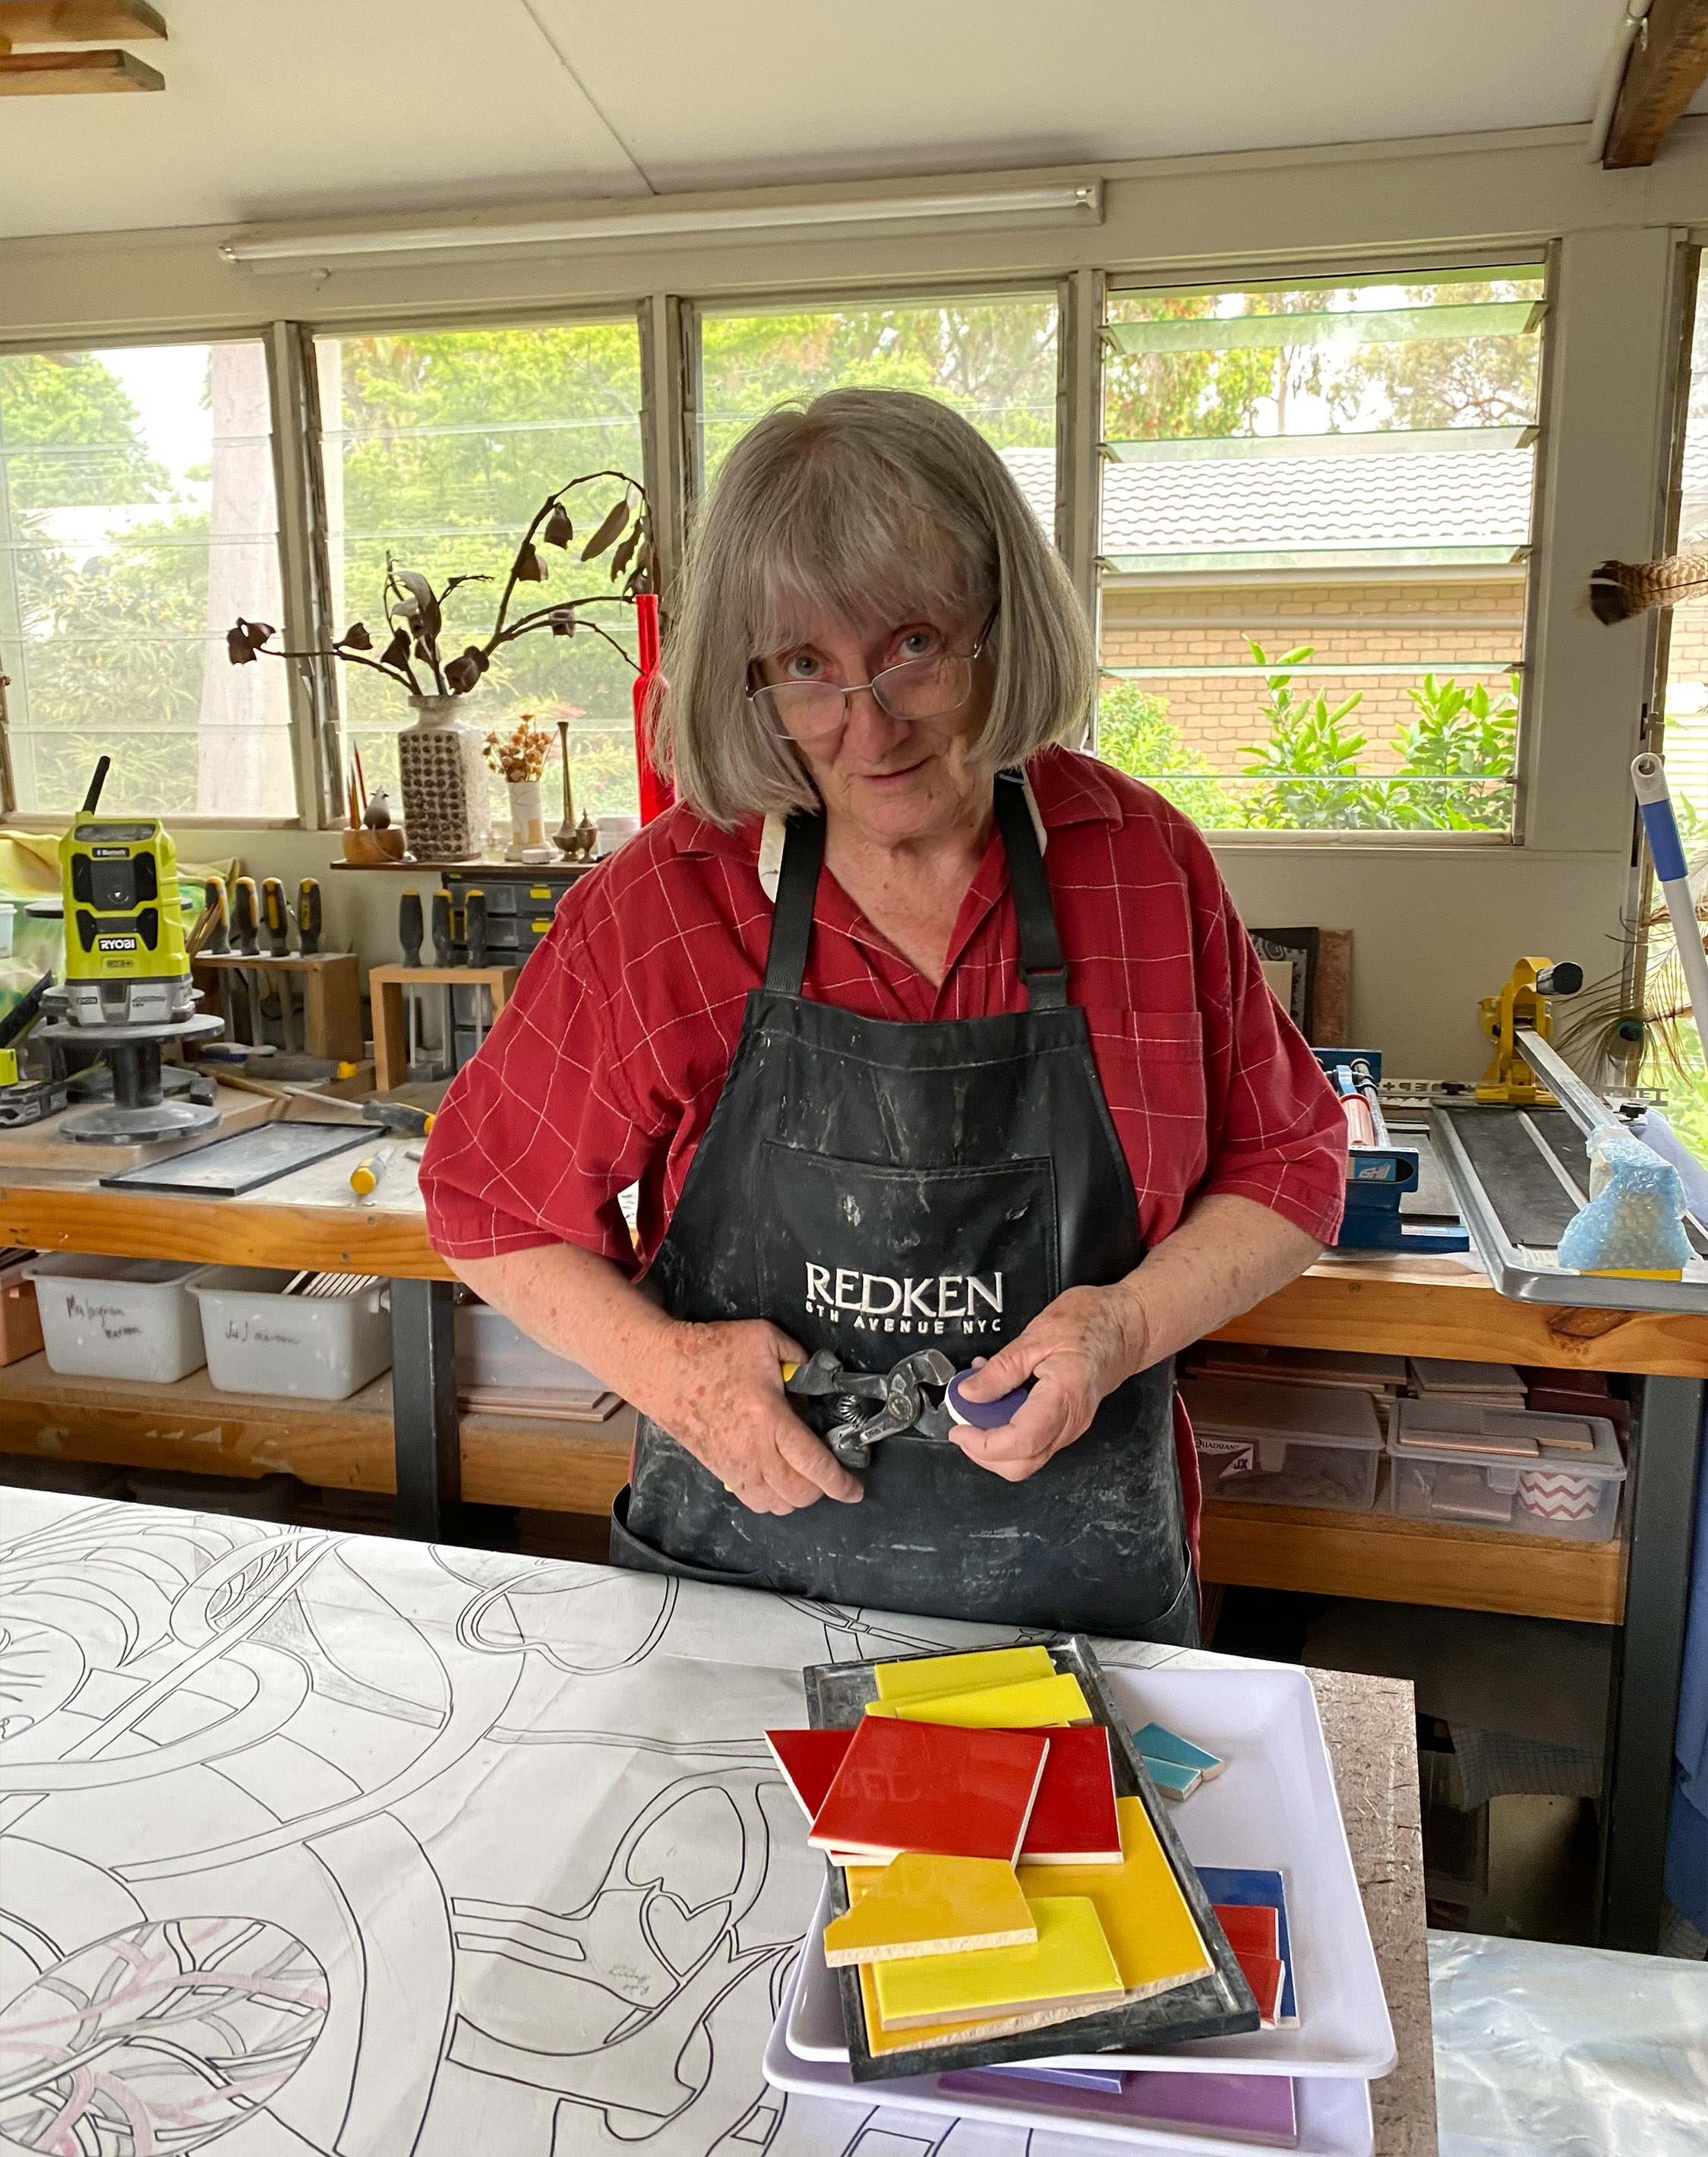 Pam Fredericks at work in her studio creating Symbols of Practice